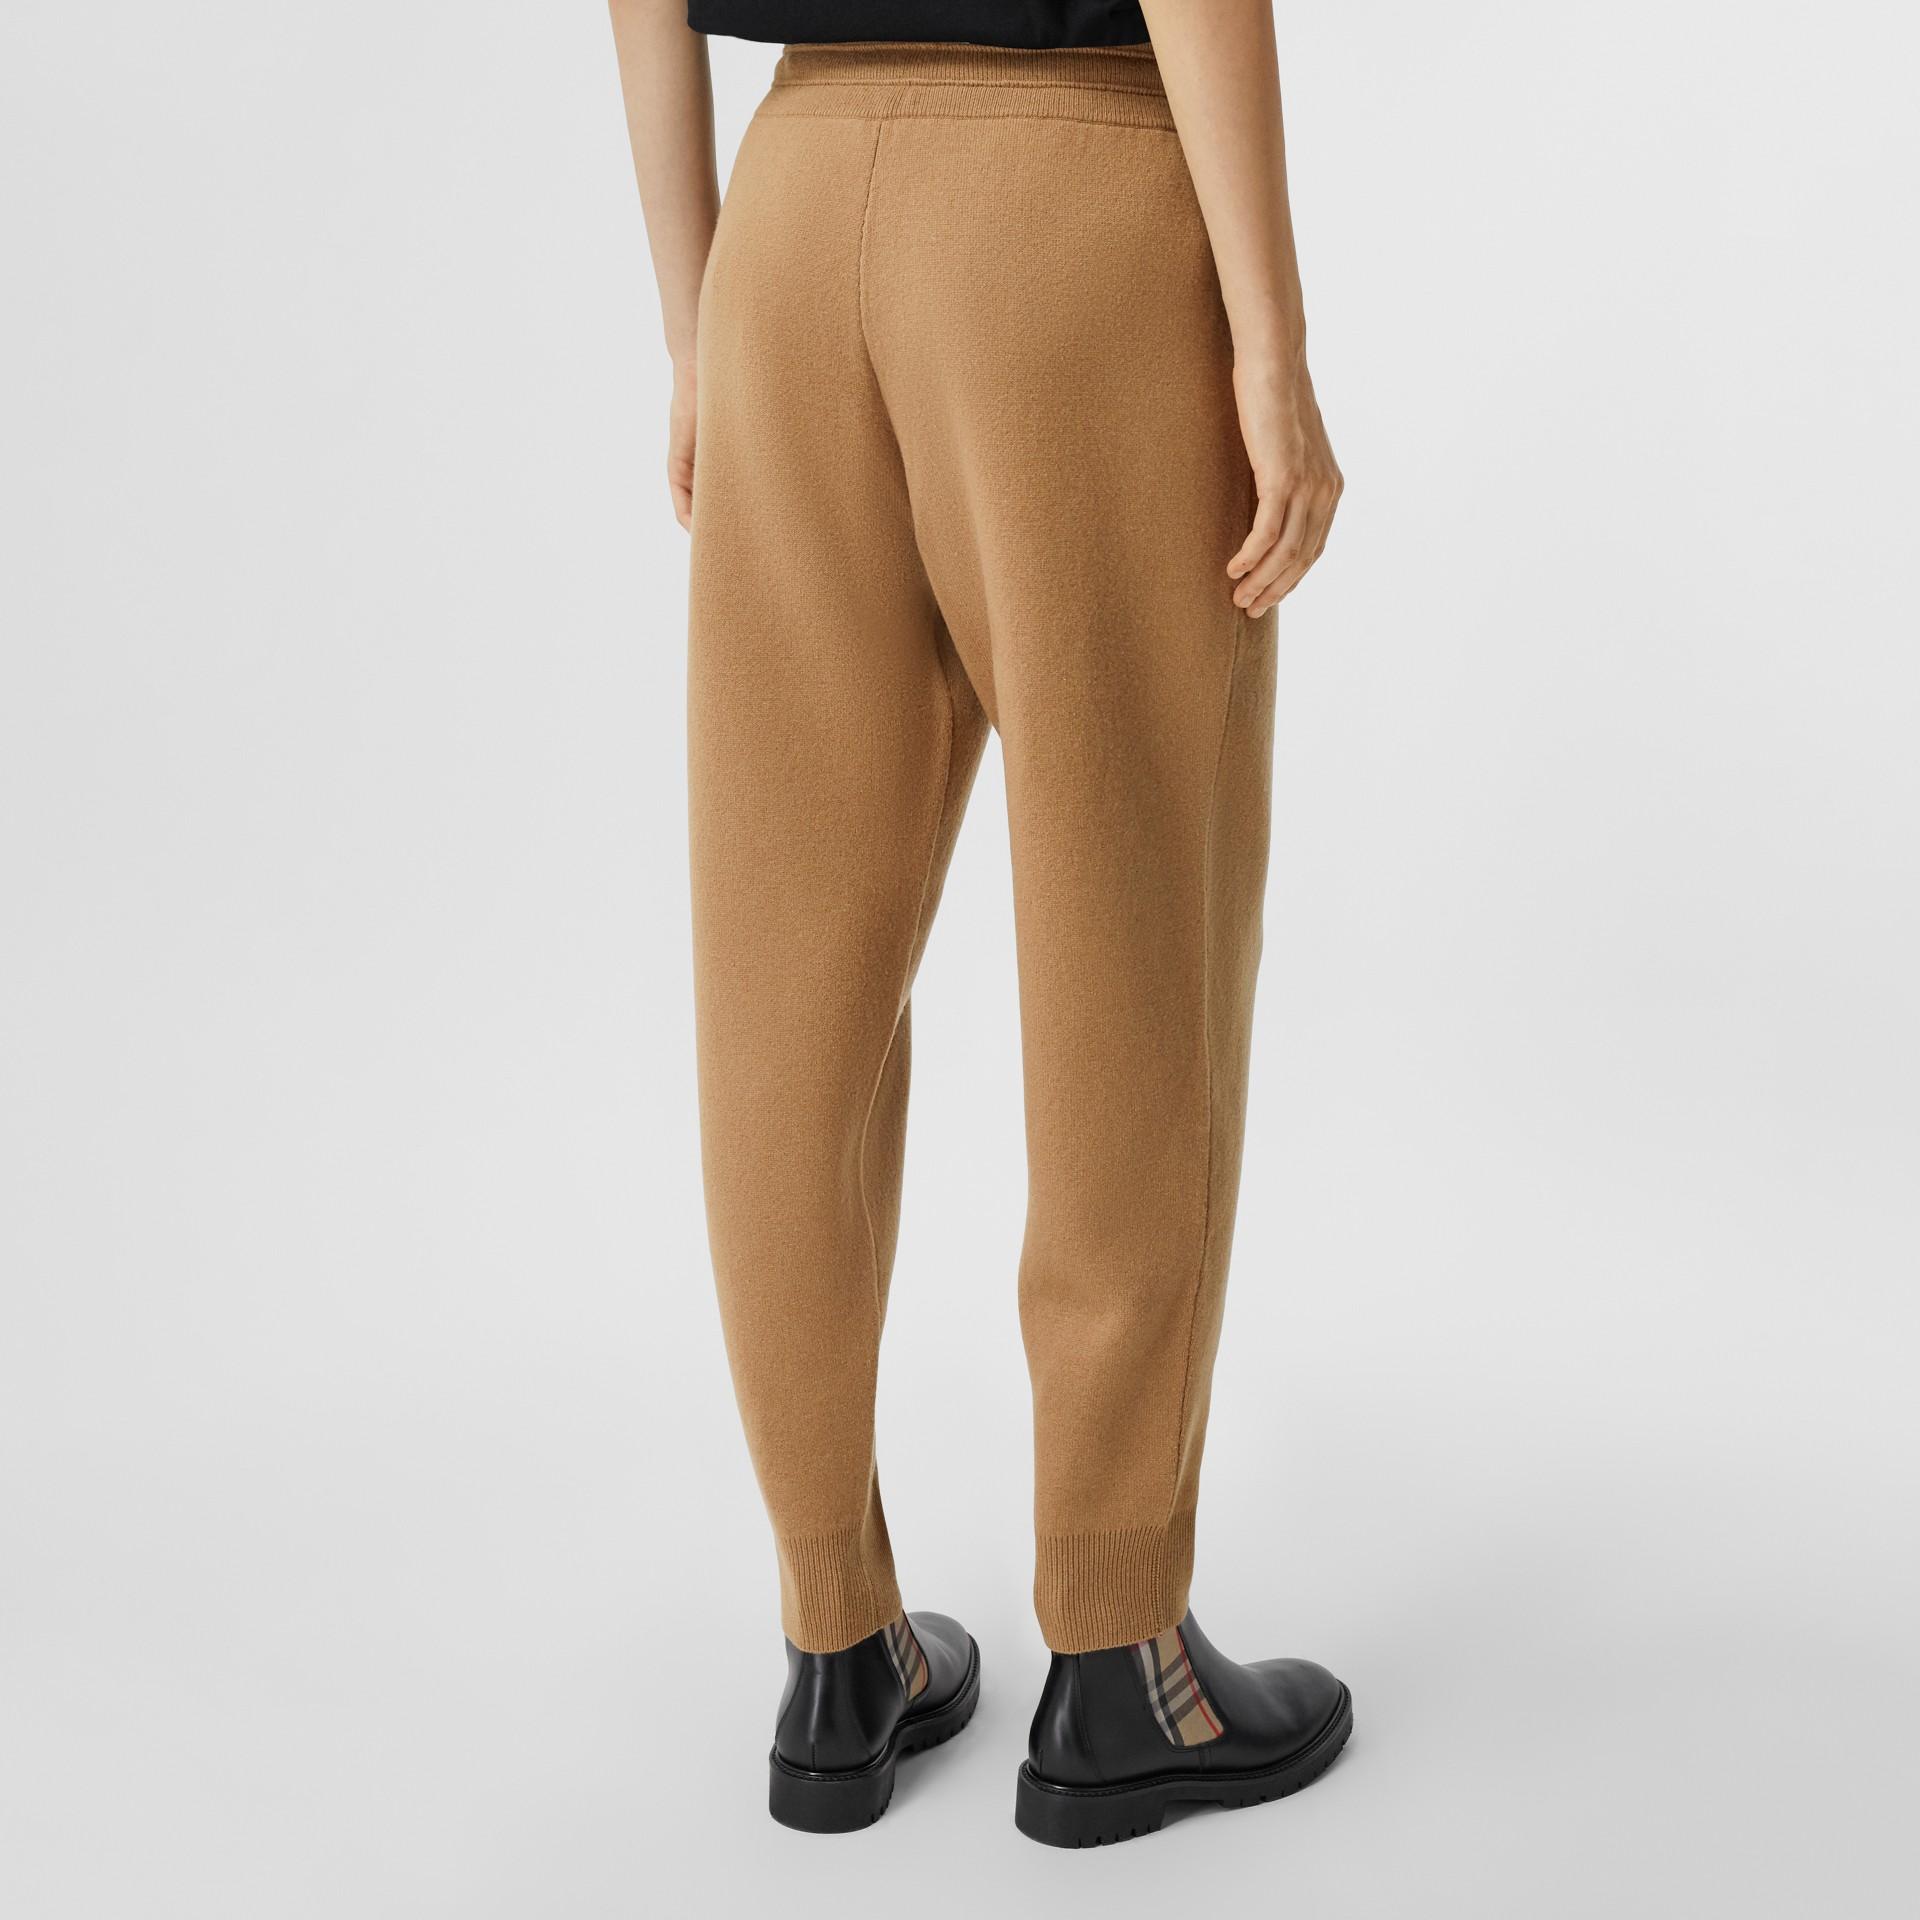 Monogram Motif Cashmere Blend Jogging Pants in Camel - Women | Burberry - gallery image 2